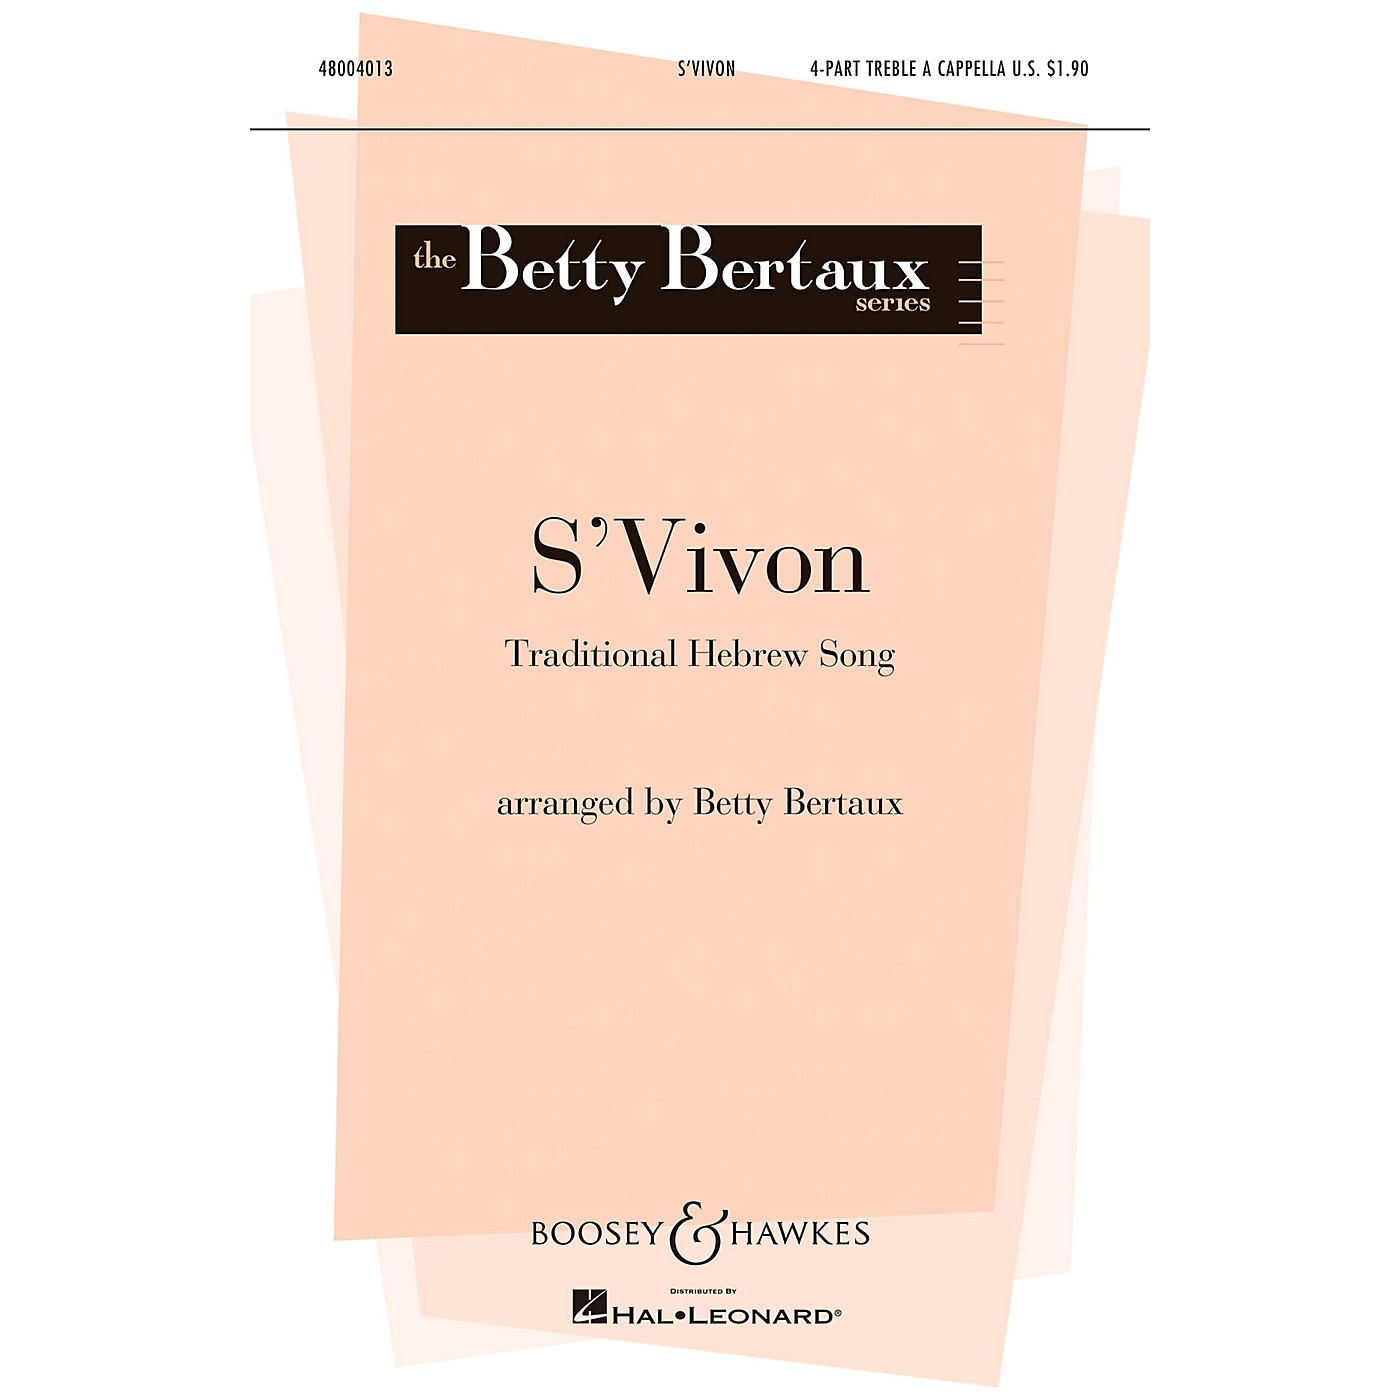 Boosey and Hawkes S'vivon (The Dreydl Song) (4-Part Treble a cappella) 4 Part Treble A Cappella arranged by Betty Bertaux thumbnail